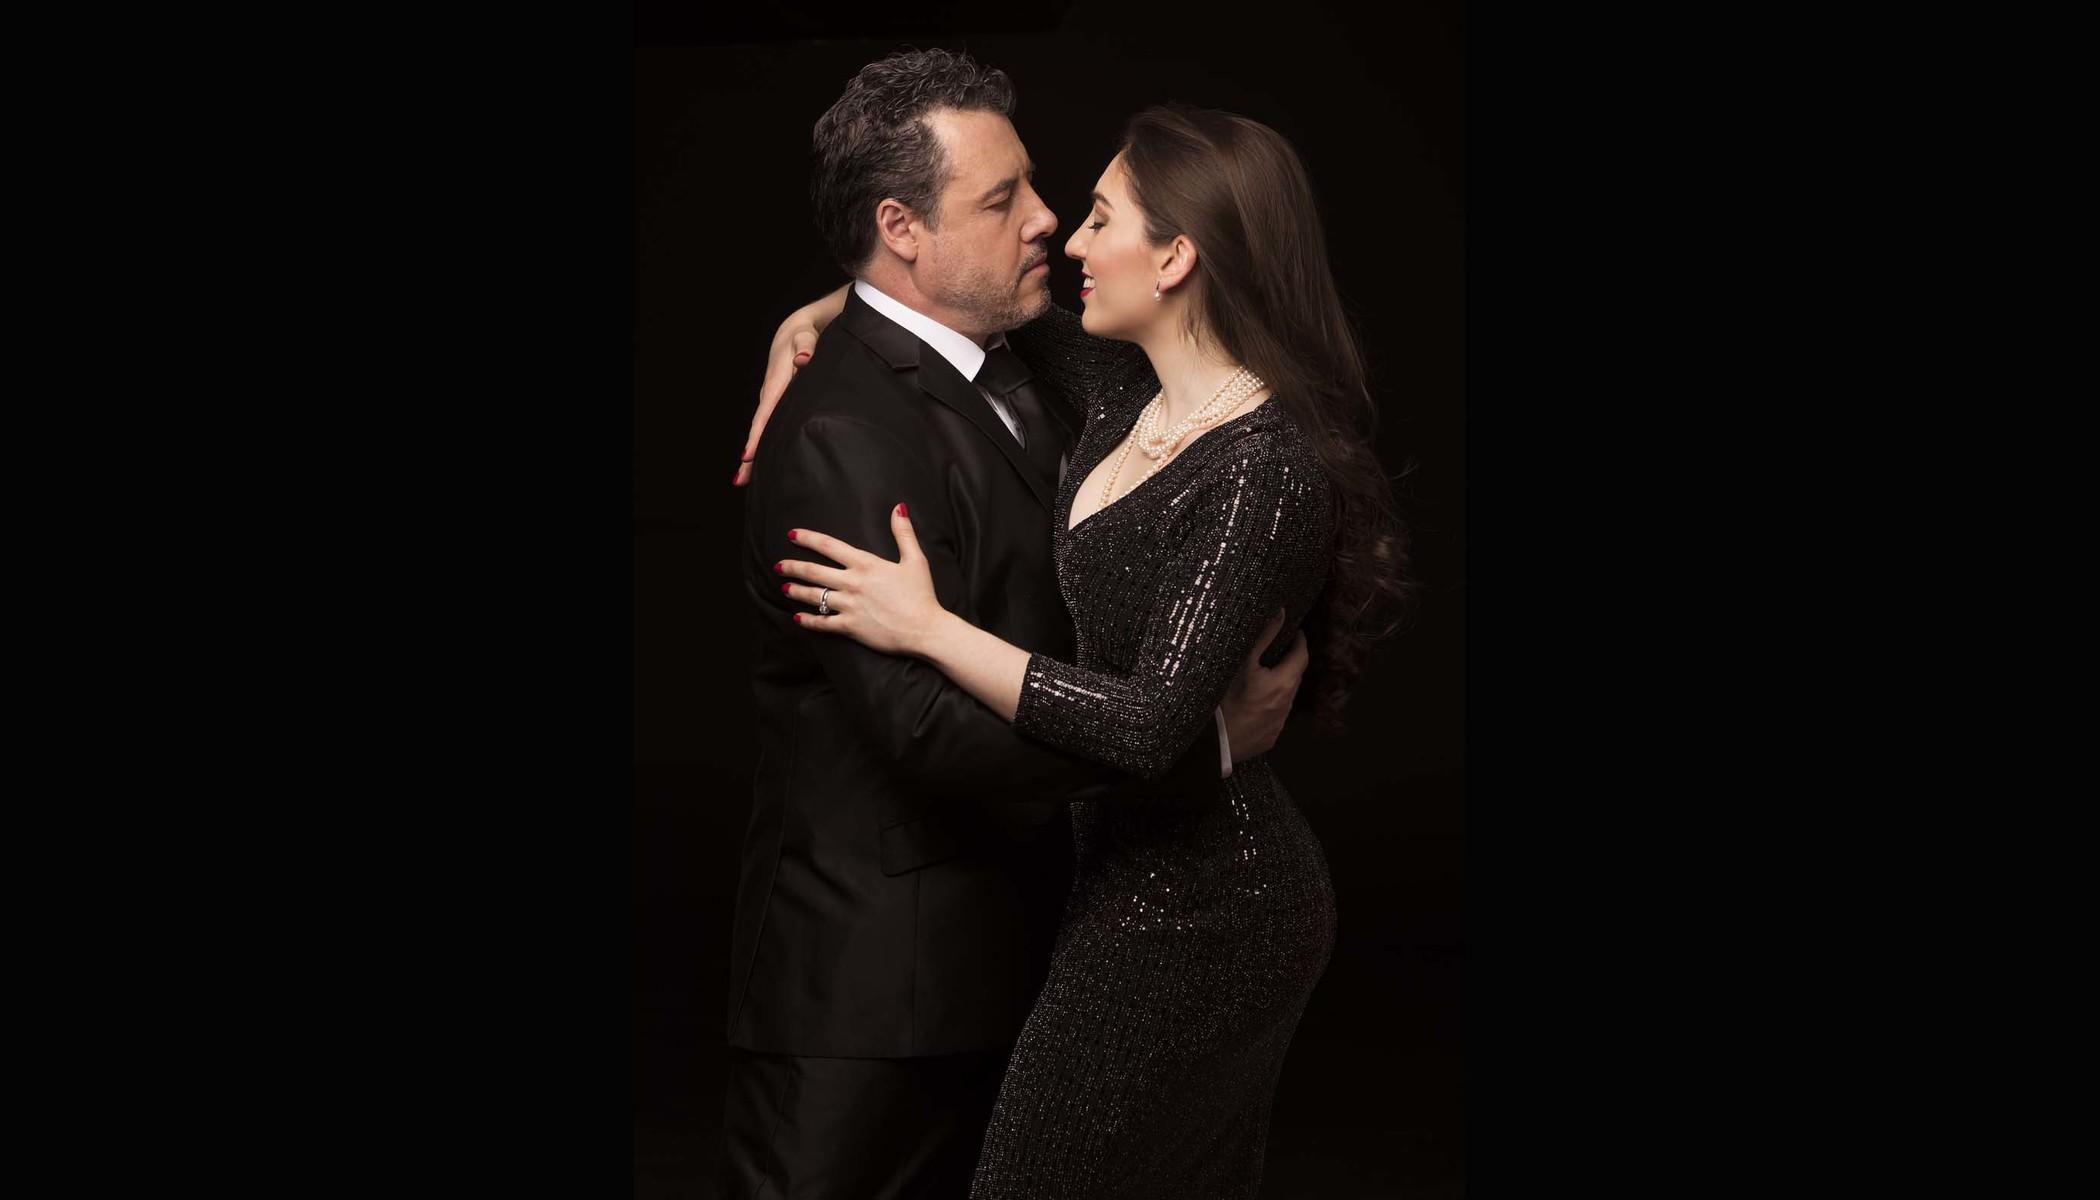 Tango singles Dating site 555 datant de